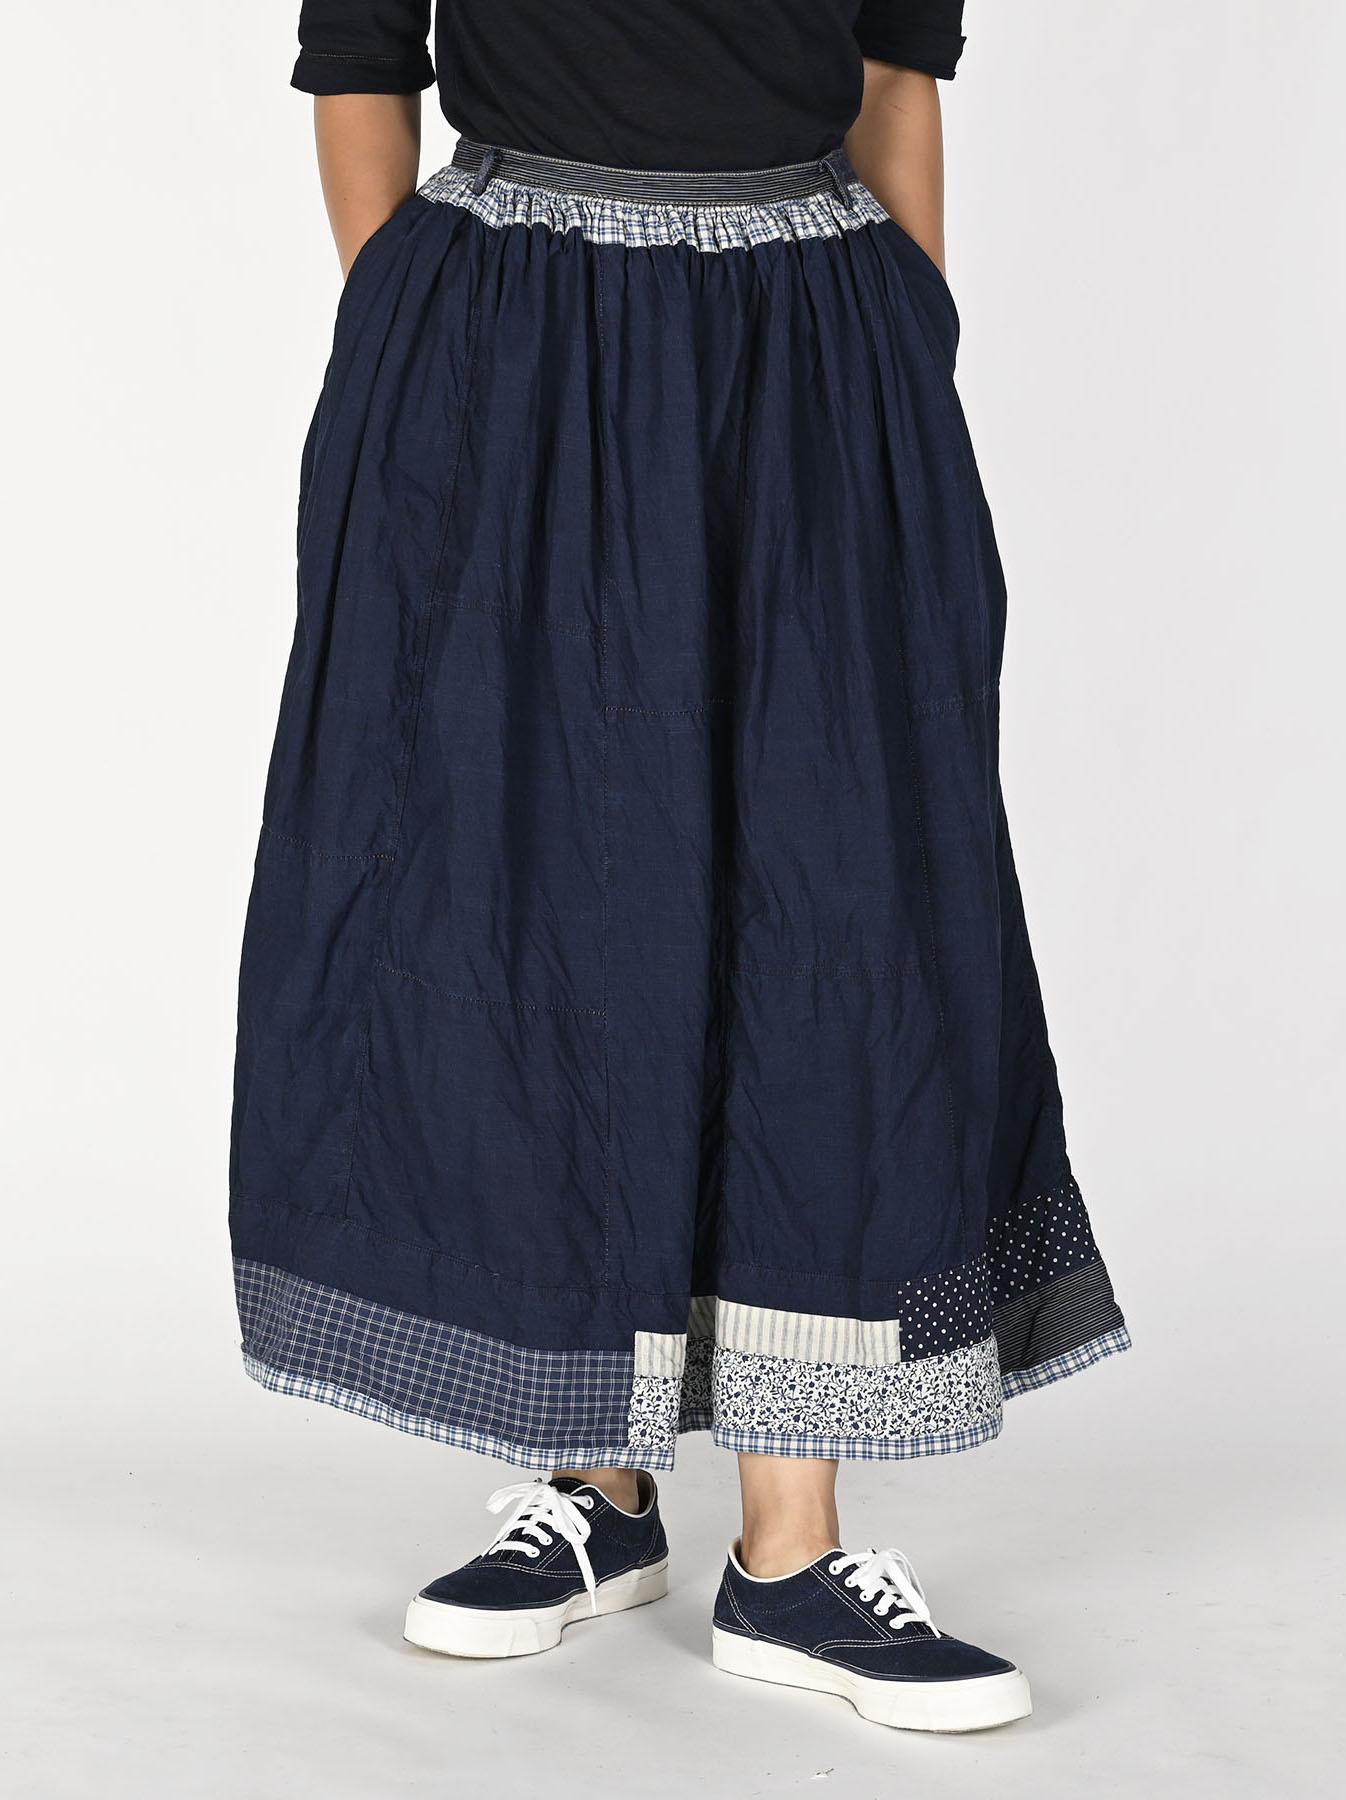 Indigo Tappet Patchwork Skirt-3